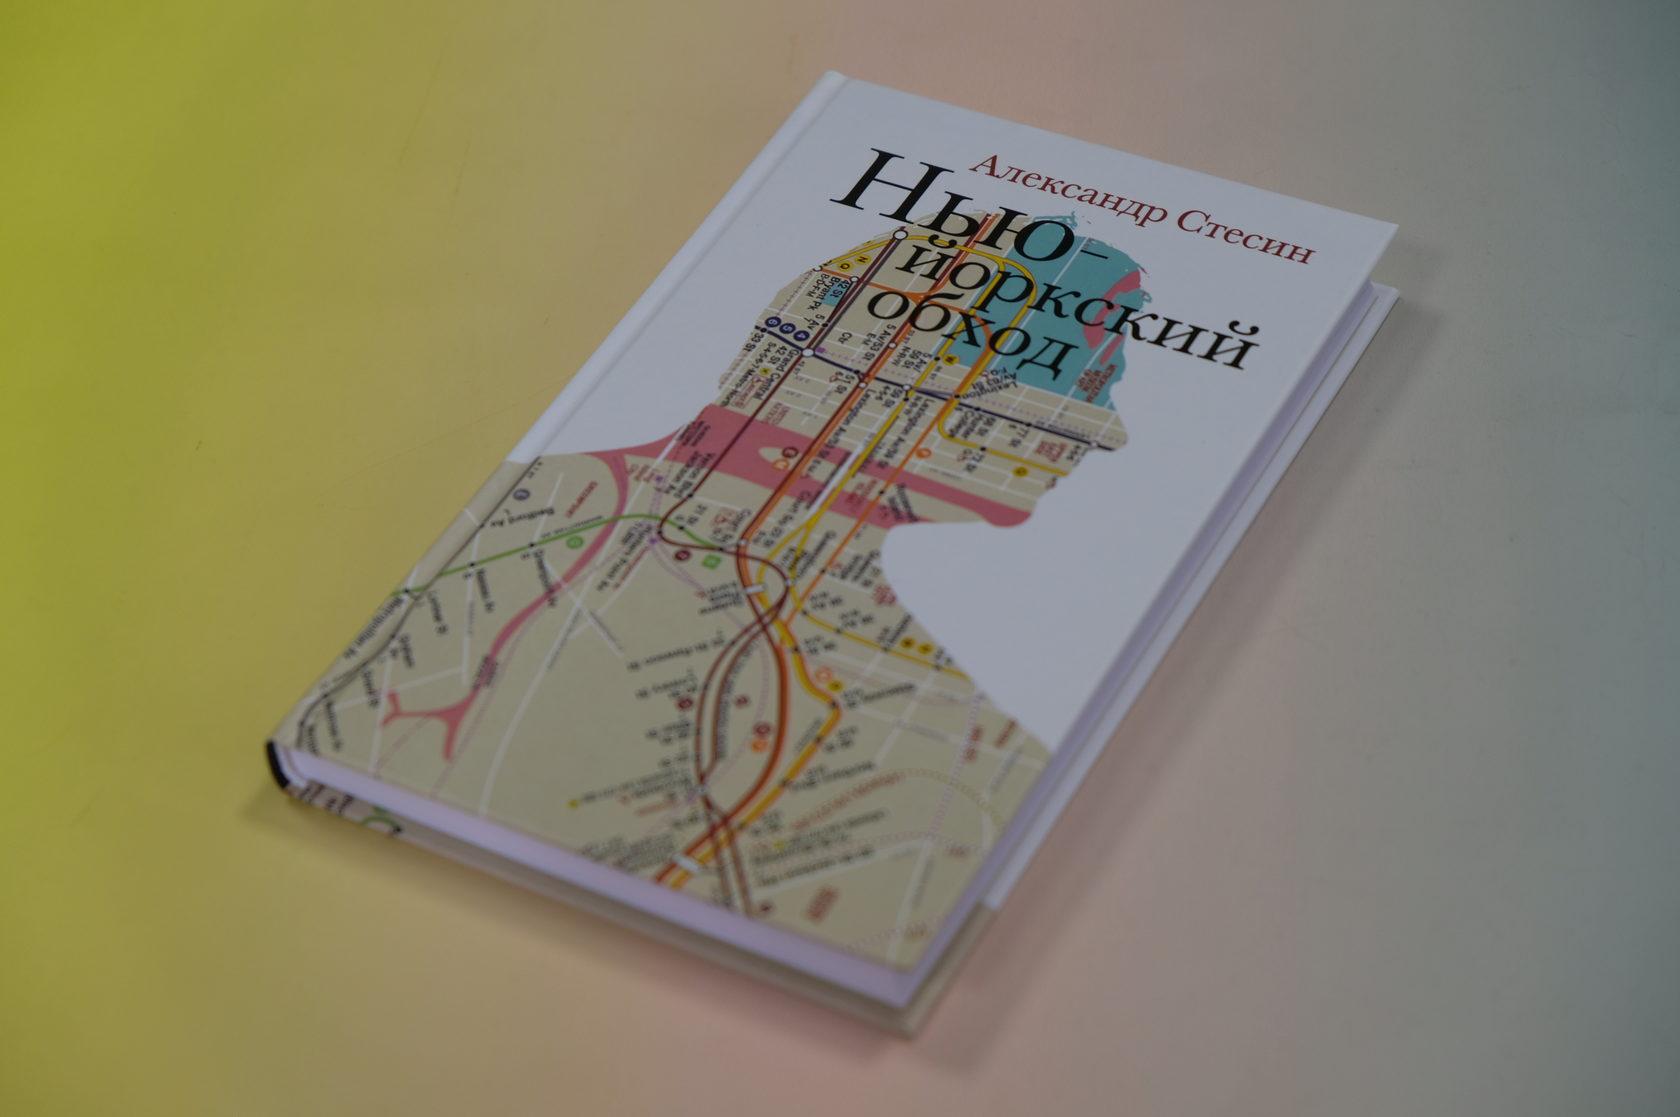 Купить книгу Александр Стесин «Нью-Йоркский обход»  978-5-4448-1110-8